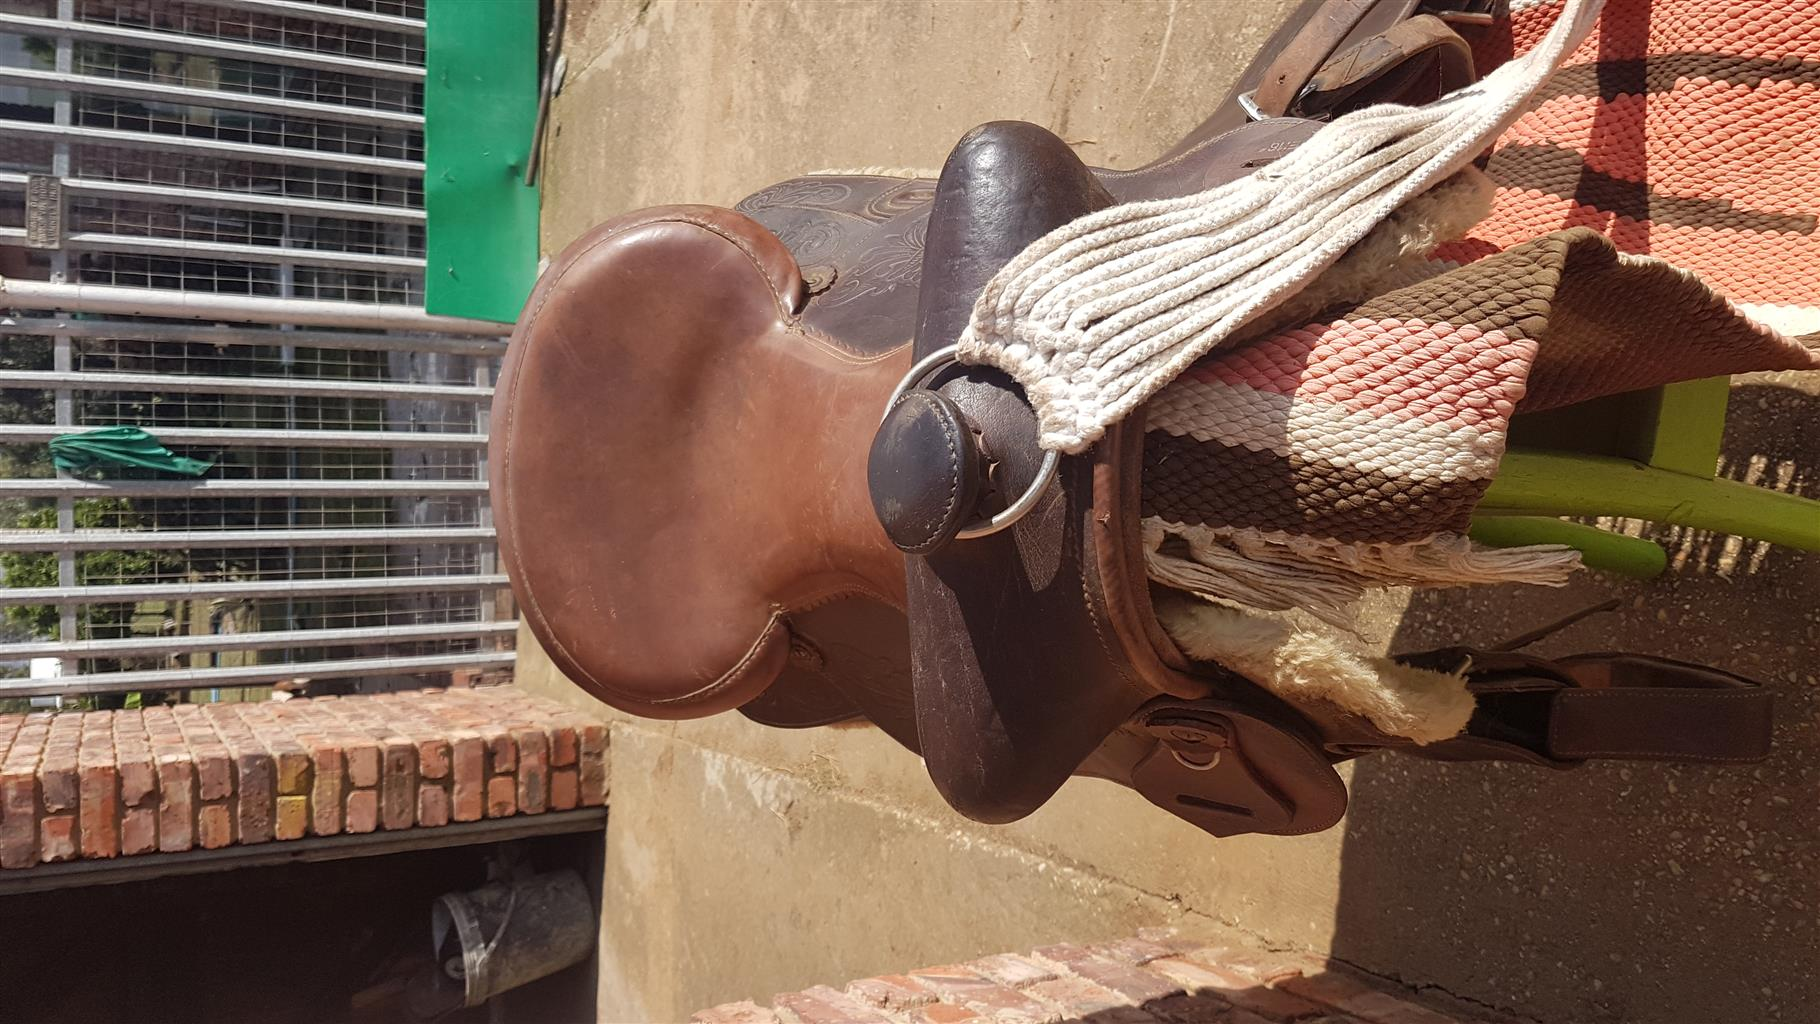 western saddle for sal